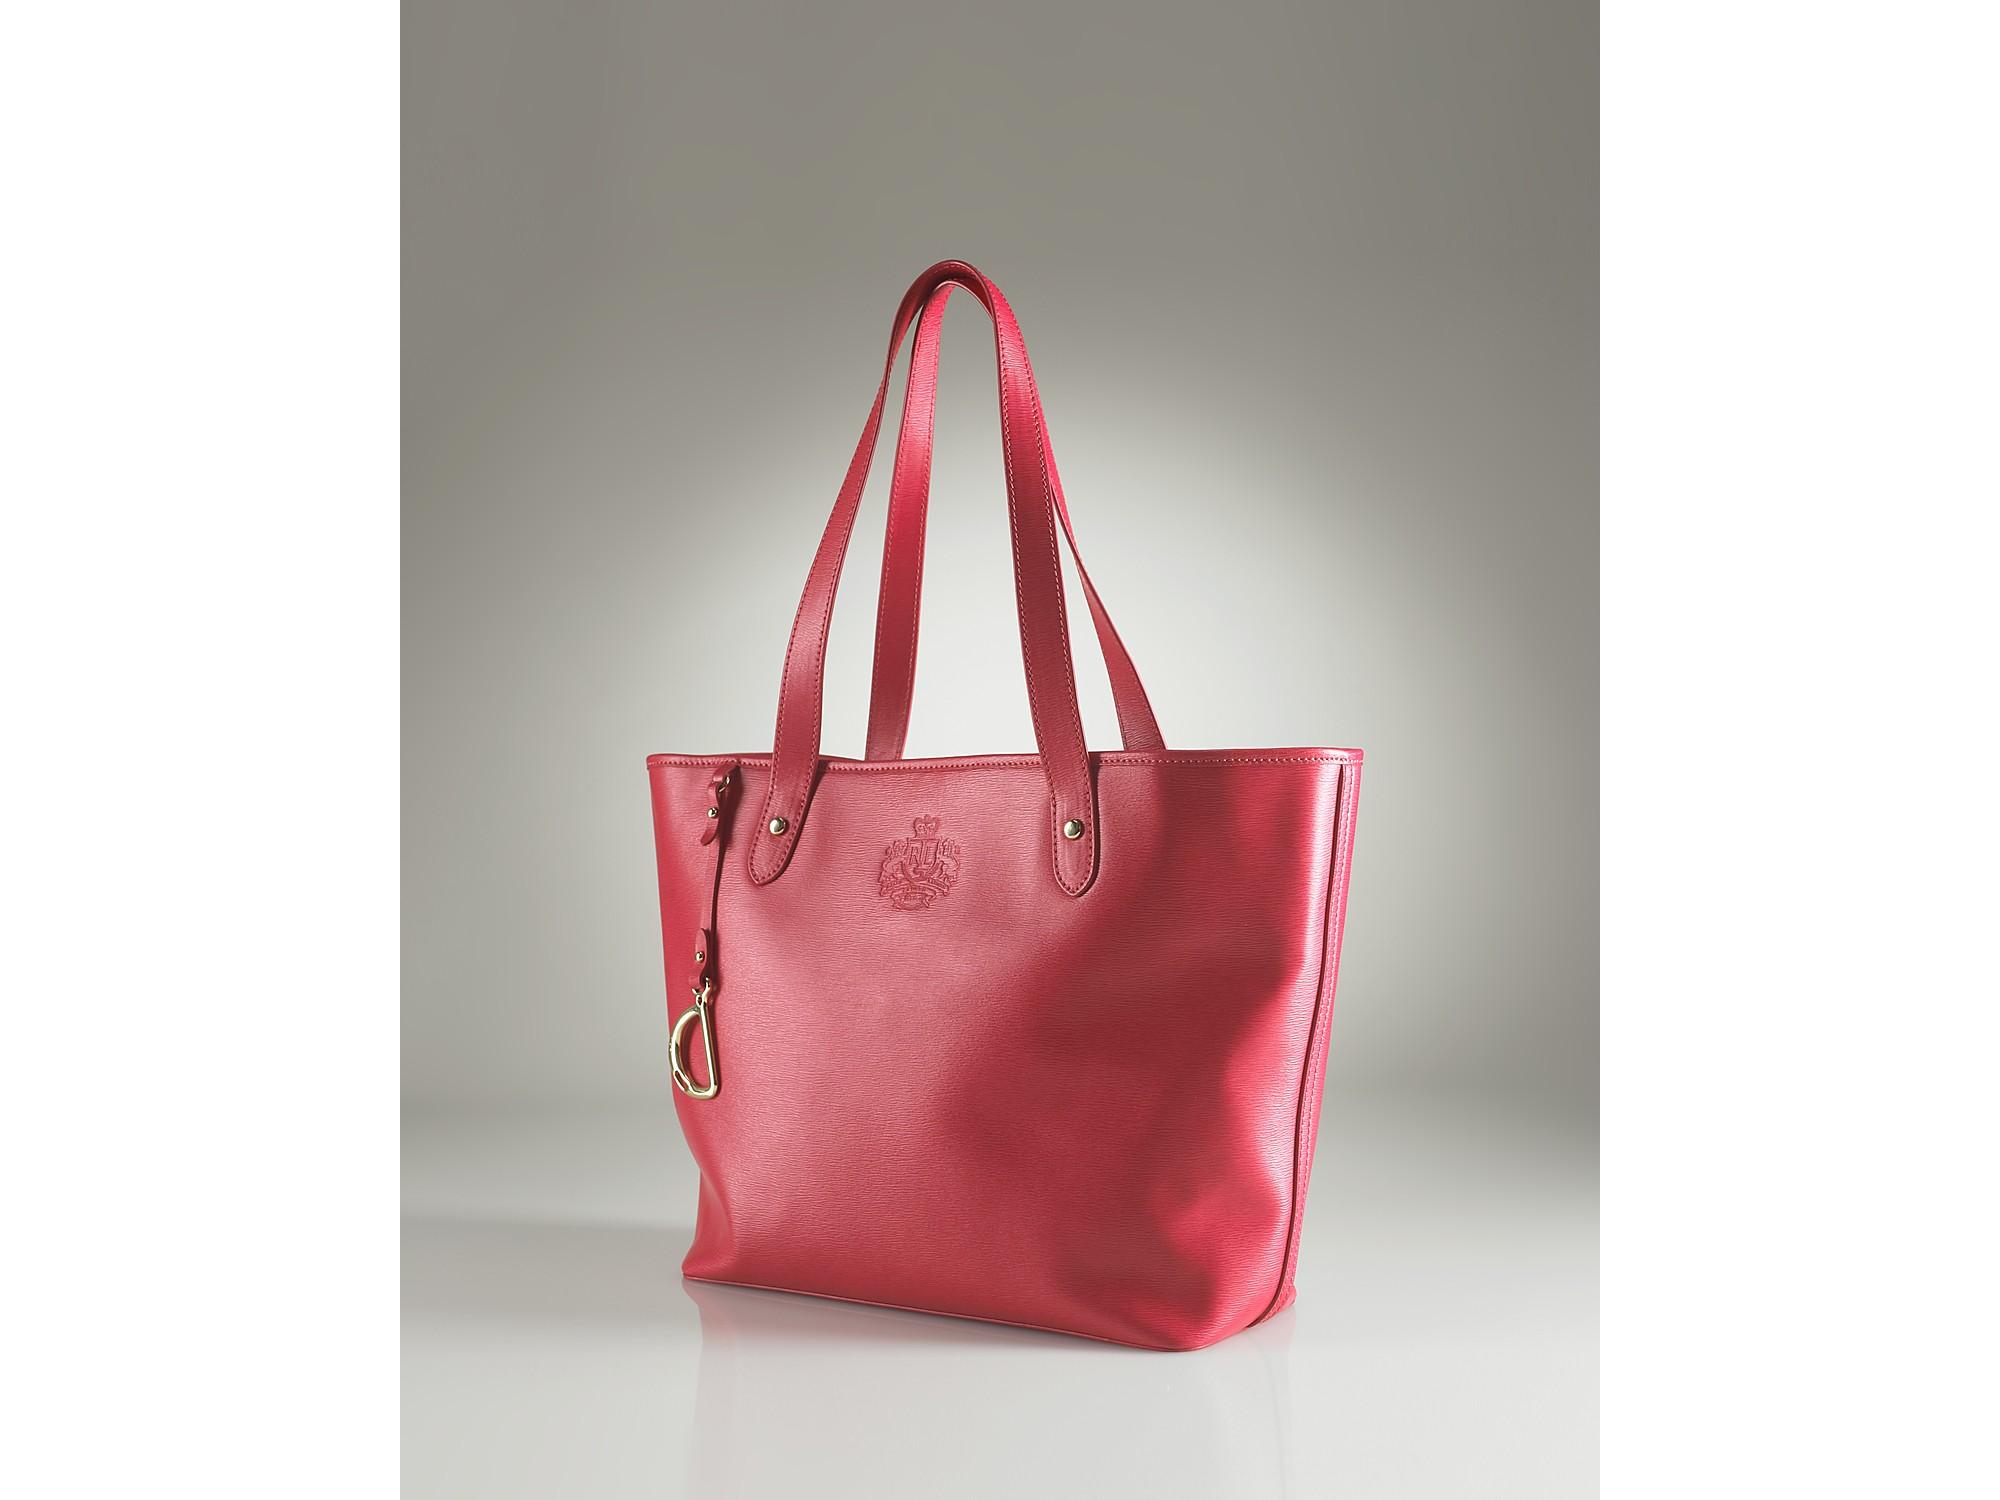 Lyst - Lauren by Ralph Lauren Lauren By Ralph Lauren Newbury Leather ... b2615ad5ad